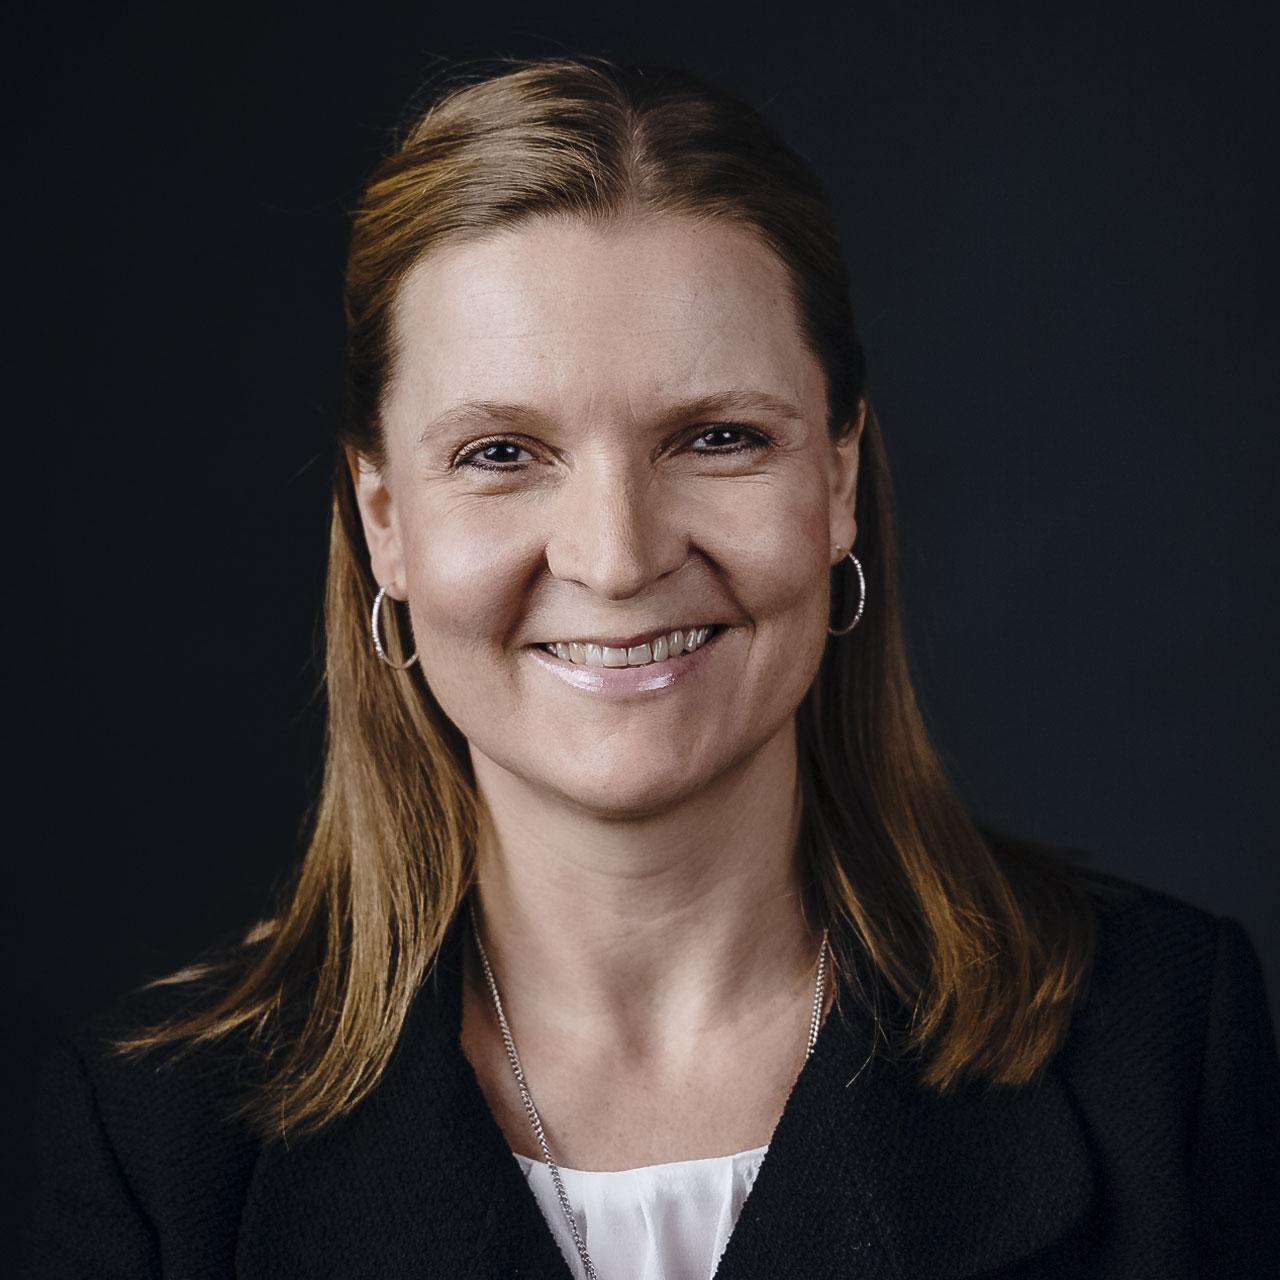 Stephanie Wende